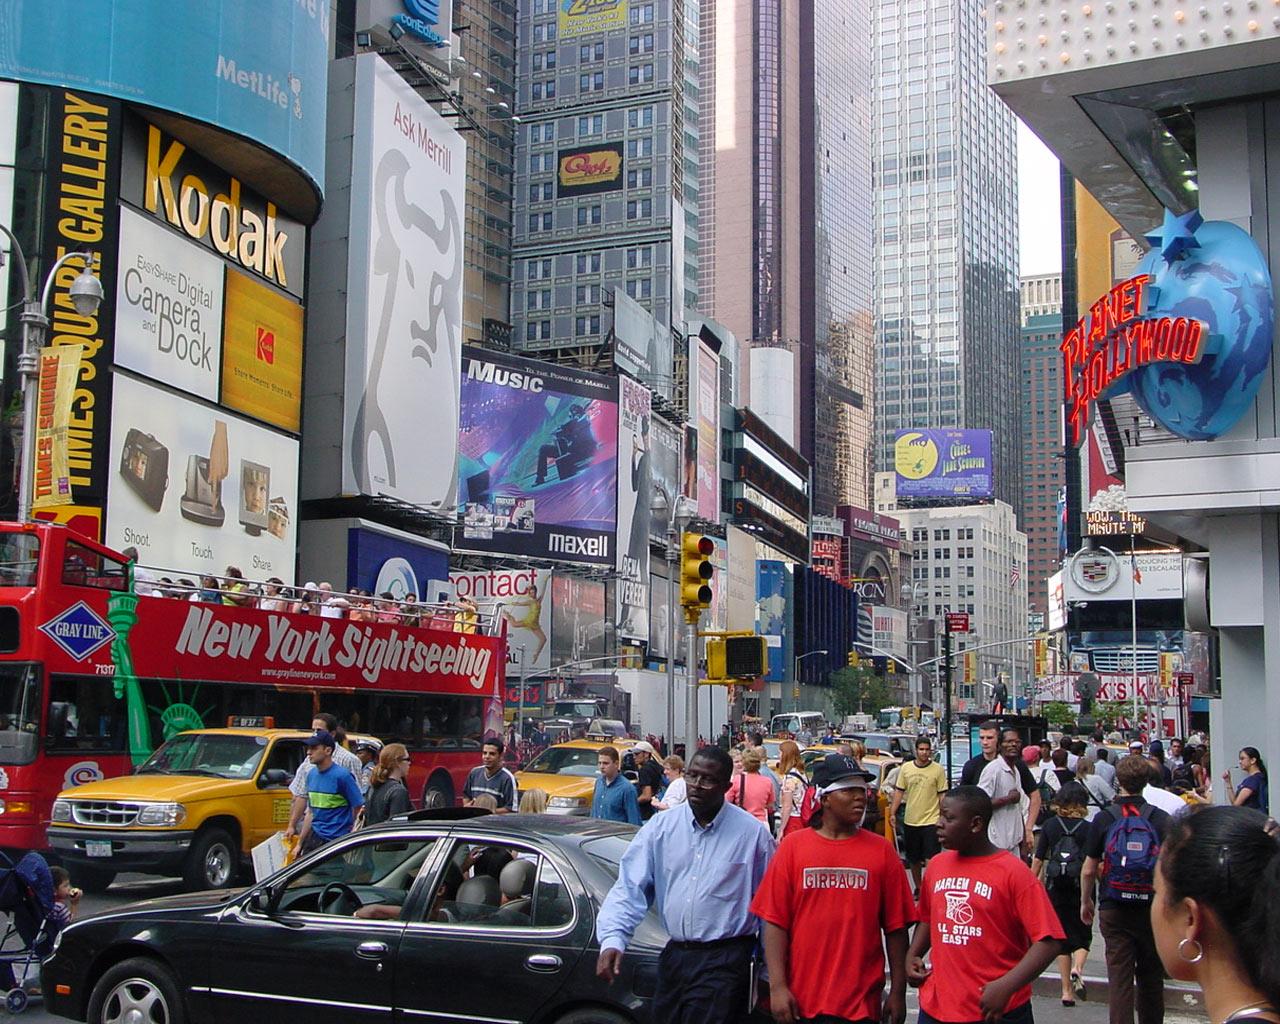 http://2.bp.blogspot.com/-GcMxB5s1Spc/Ta2vV7esXZI/AAAAAAAABHM/-loVHvOnNt4/s1600/Times_Square%252C_New_York_City.jpg